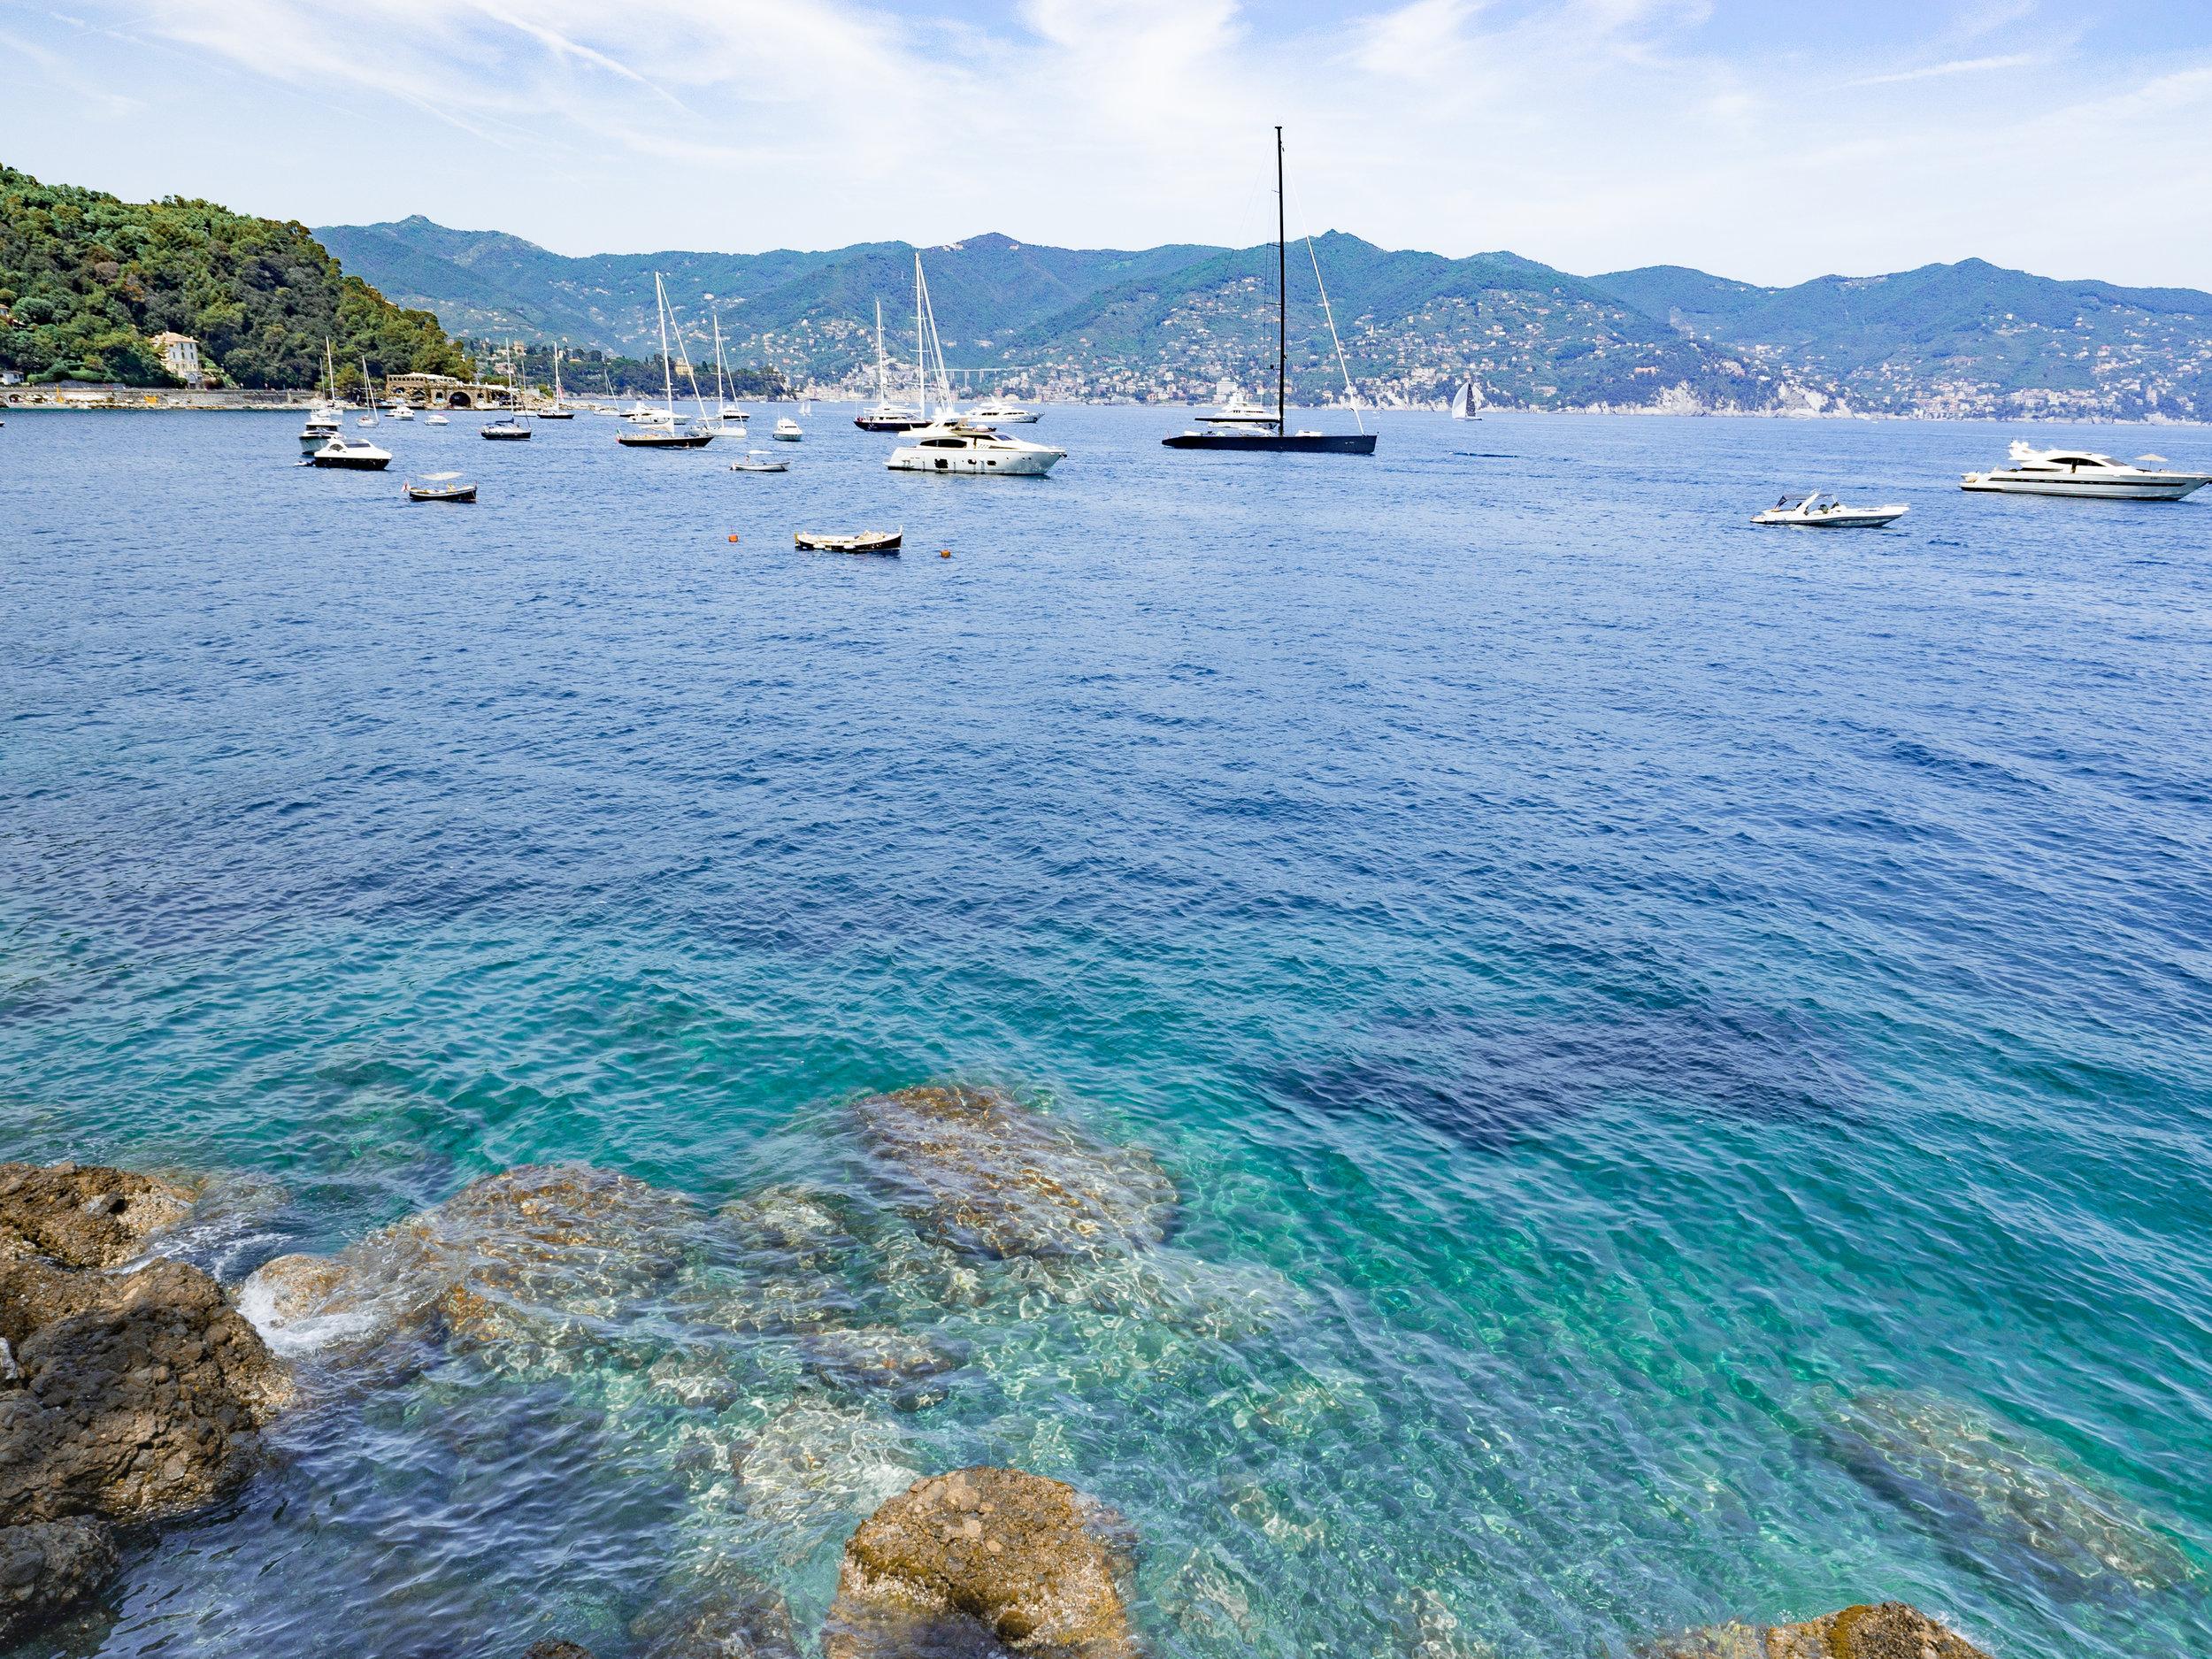 On the edge of S. Margherita, heading into Portofino